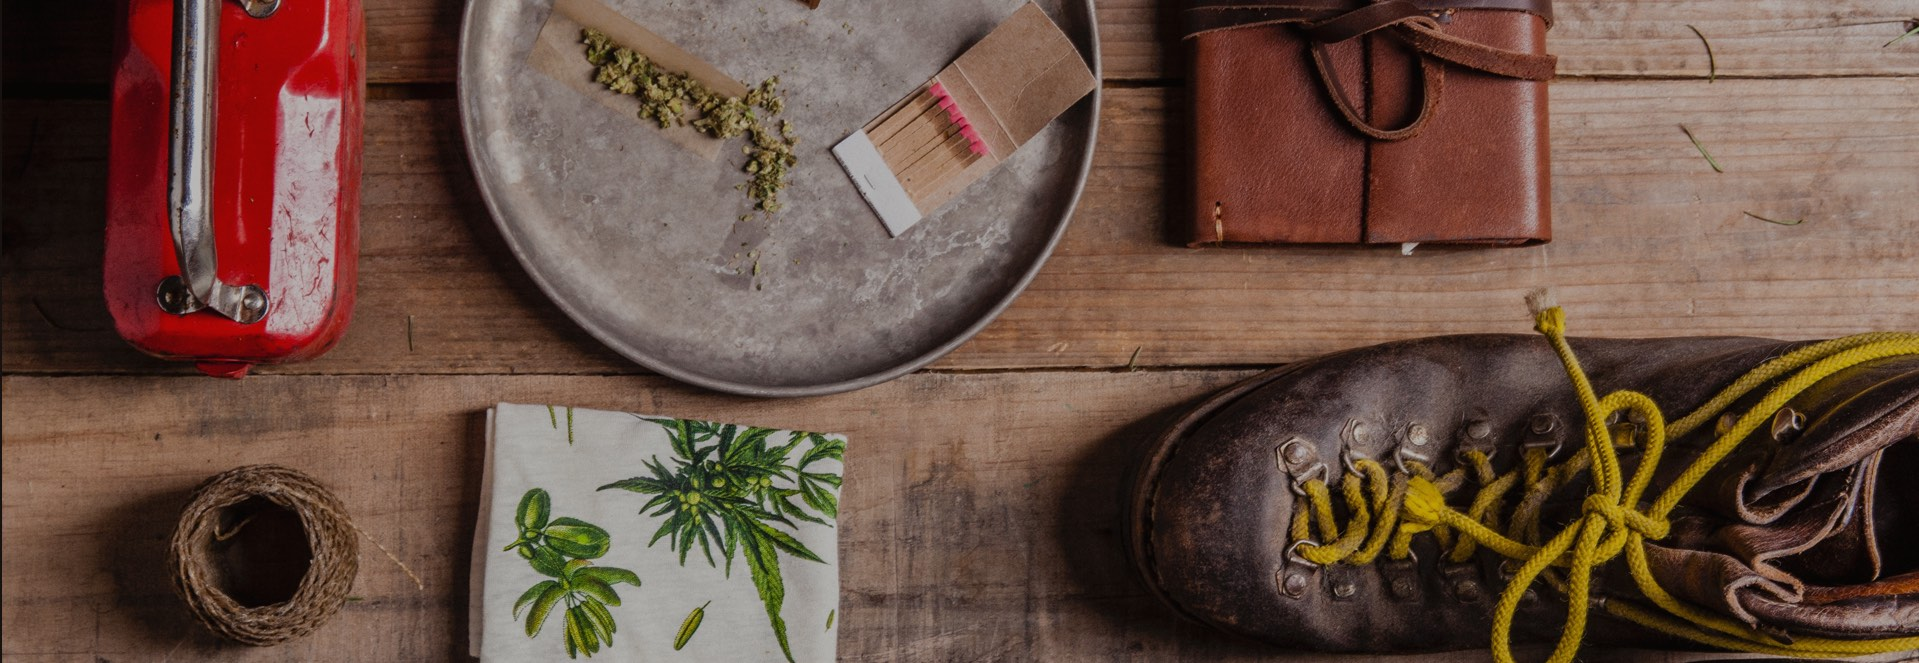 Canna Provisions Group Marijuana Dispensaries in Massachusetts